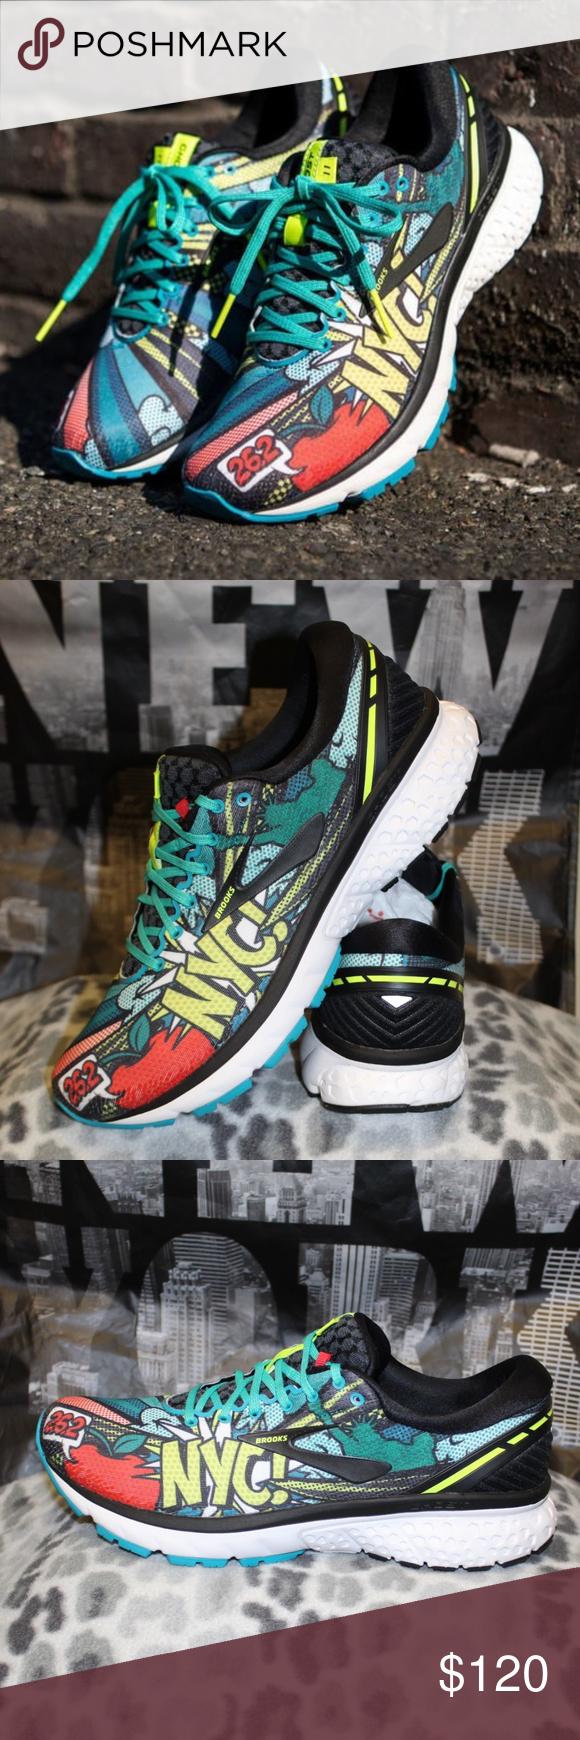 Women 10.5 NYC | Brooks shoes, Brooks